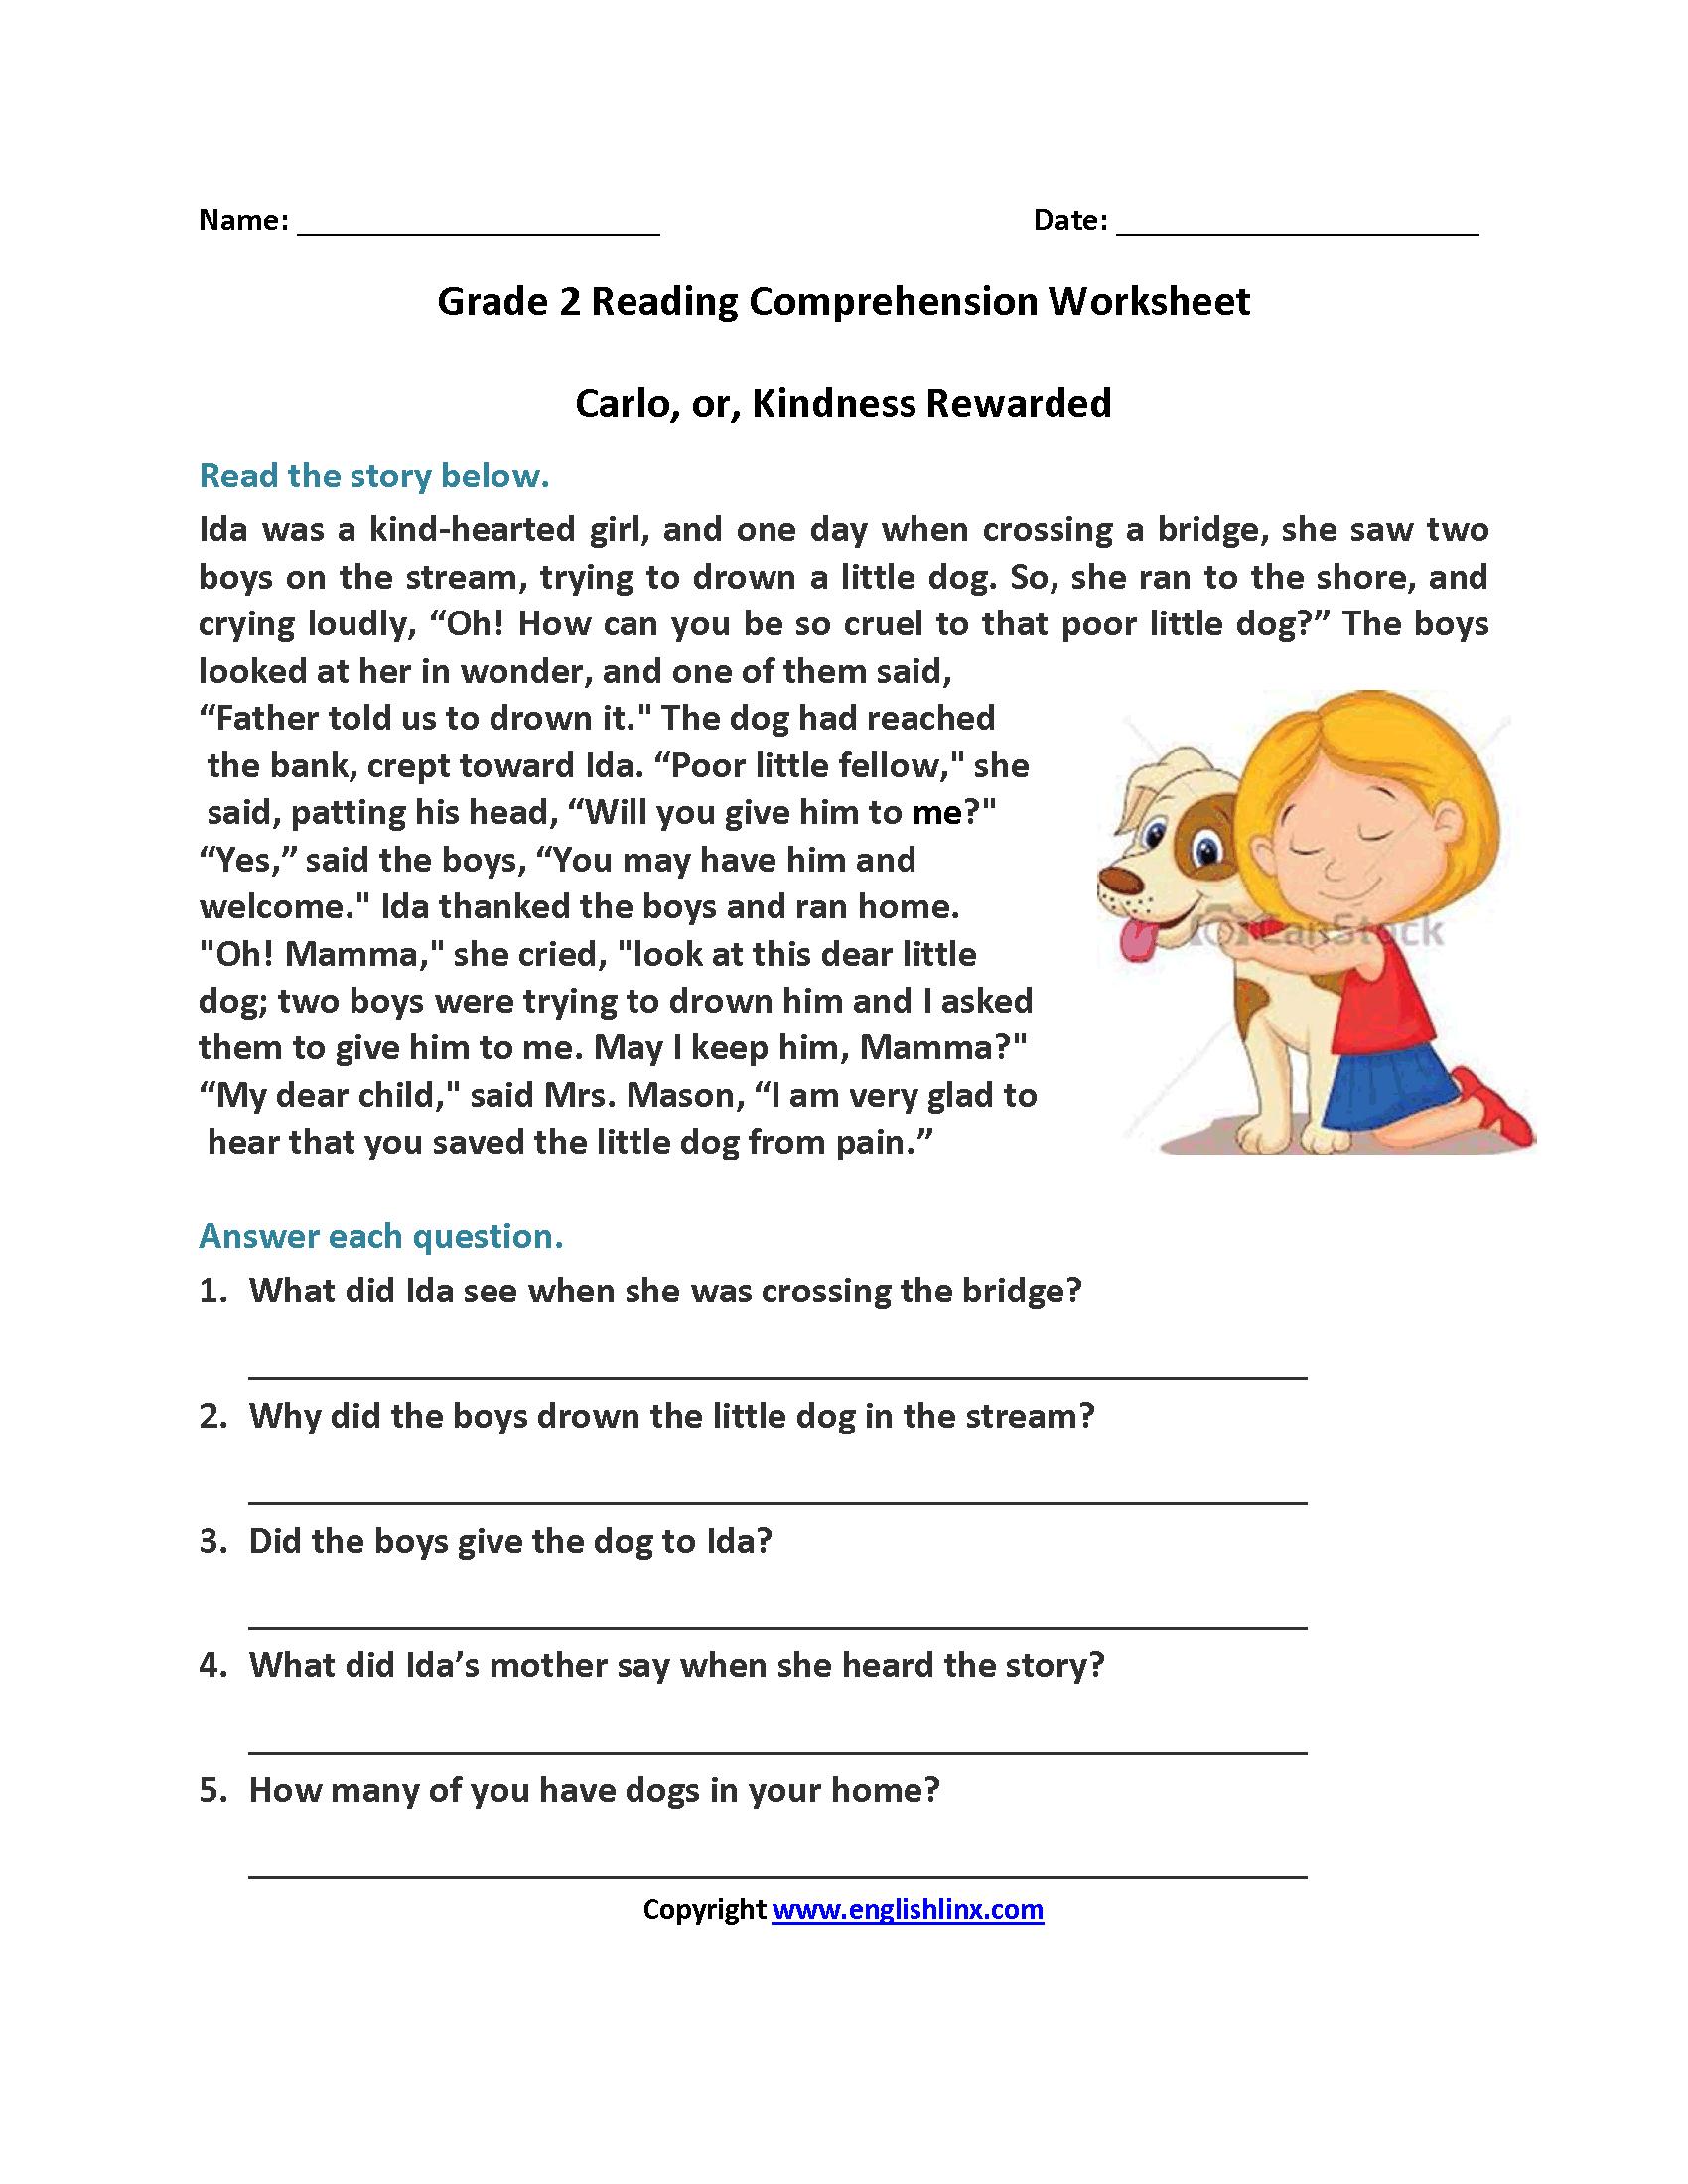 Carlo Or Kindness Rewarded Second Grade Reading Worksheets   Reading - Free Printable Reading Comprehension Worksheets Grade 5